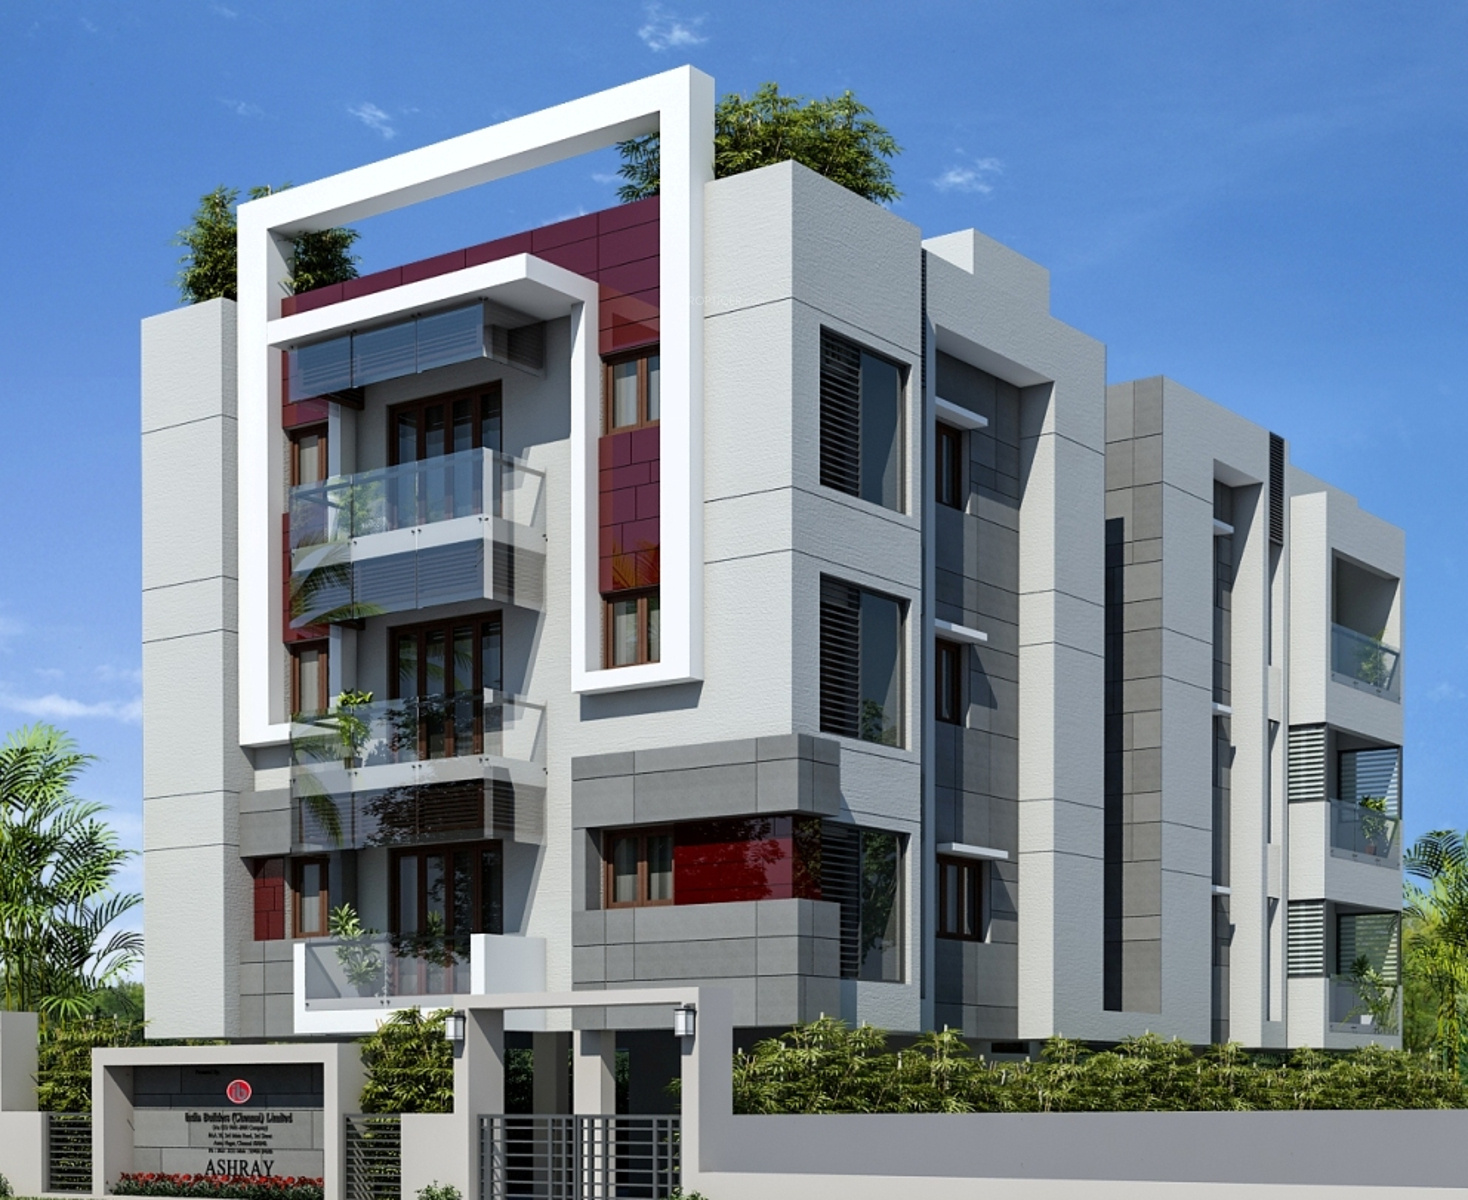 4 Floor Apartment Elevation : Main elevation image of india builders ashraya unit